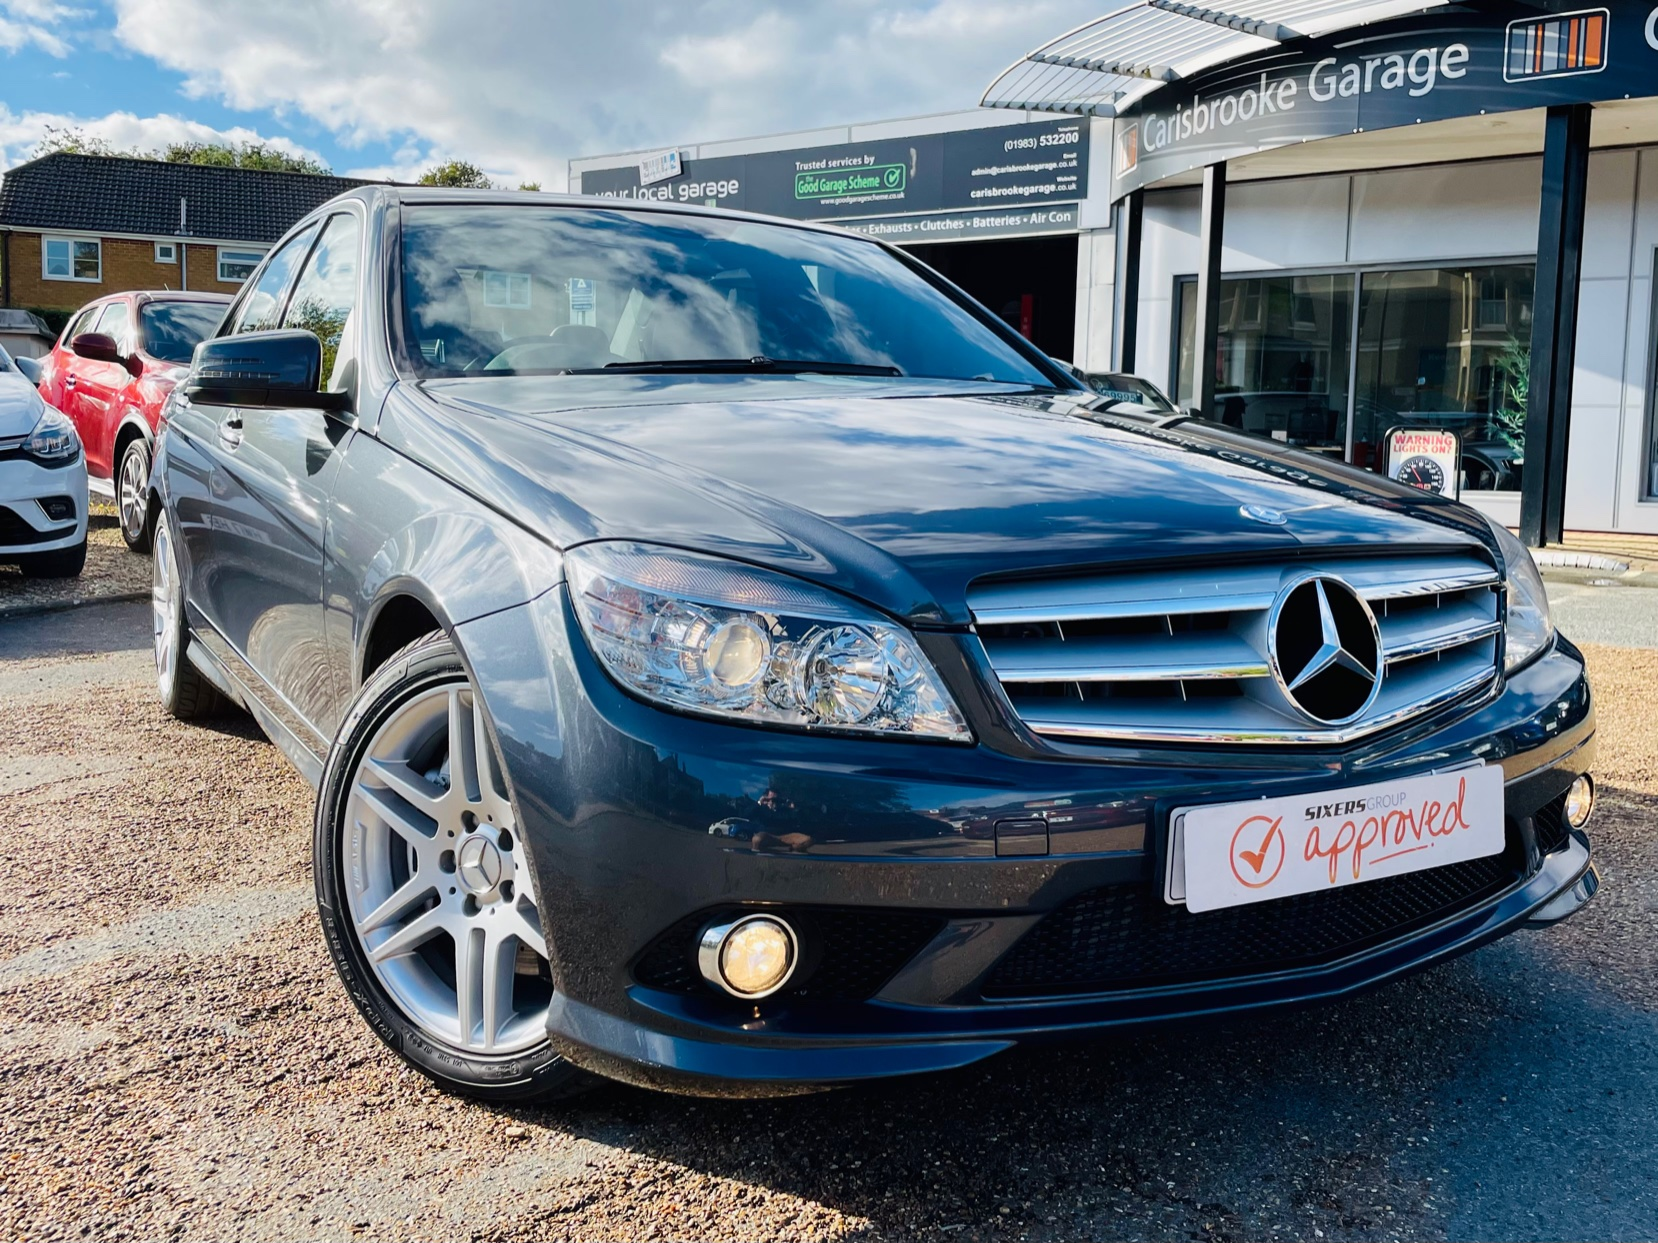 Car For Sale Mercedes C-Class - KP58ZHH Sixers Group Image #0